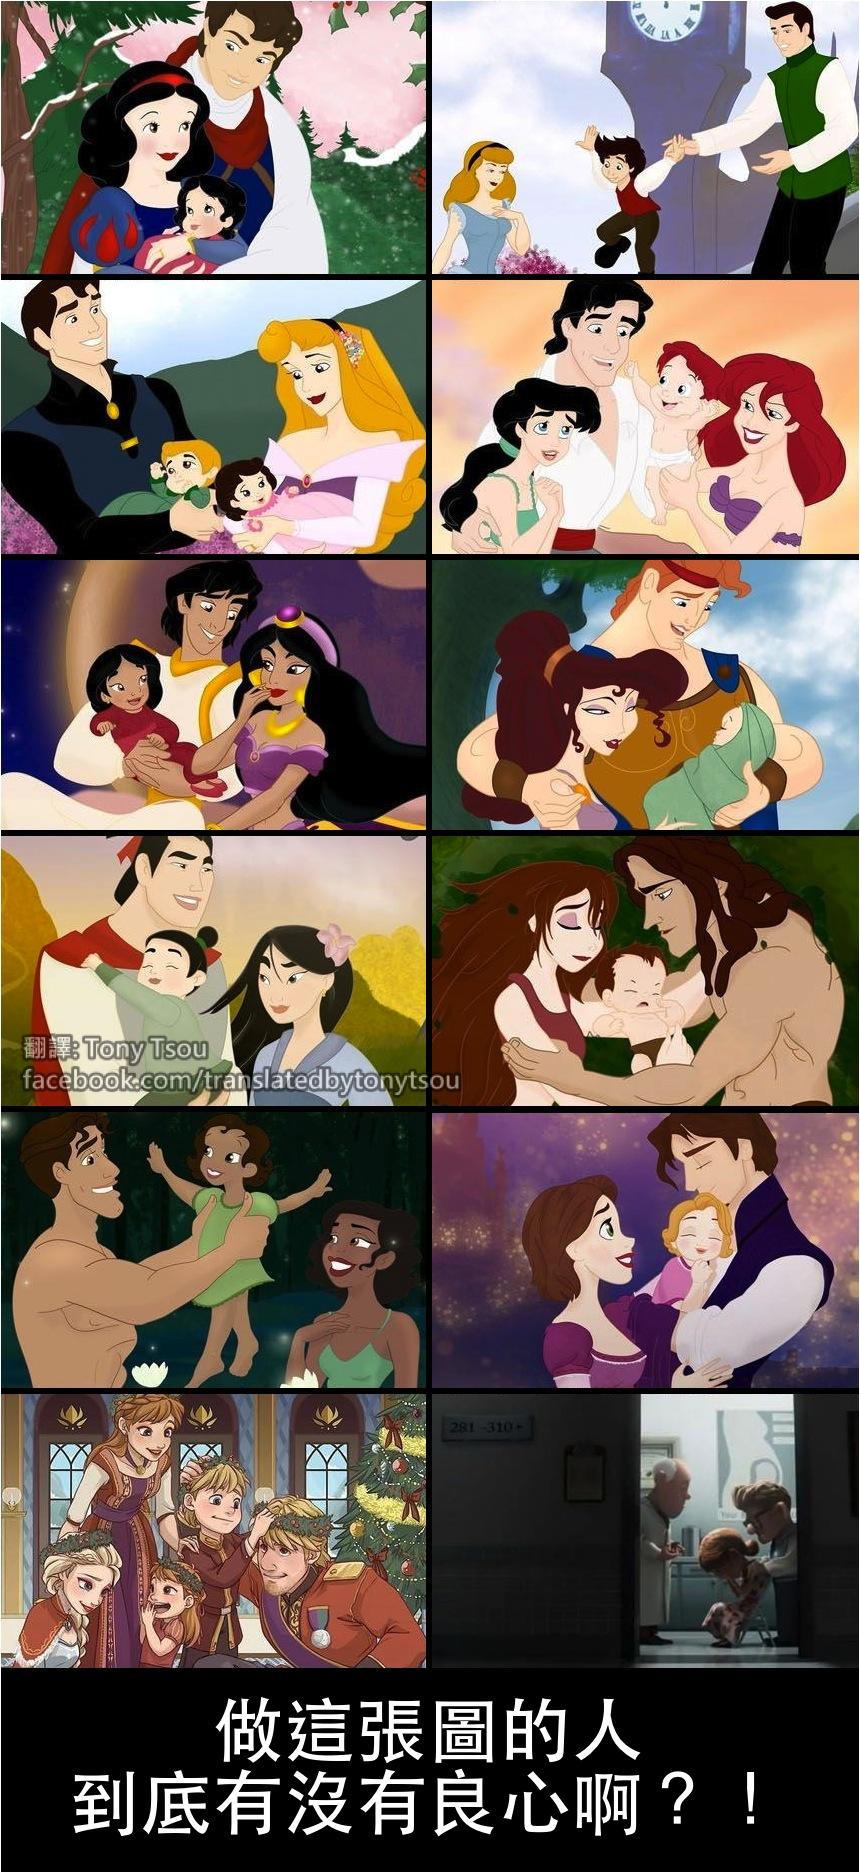 DisneyUpEnding